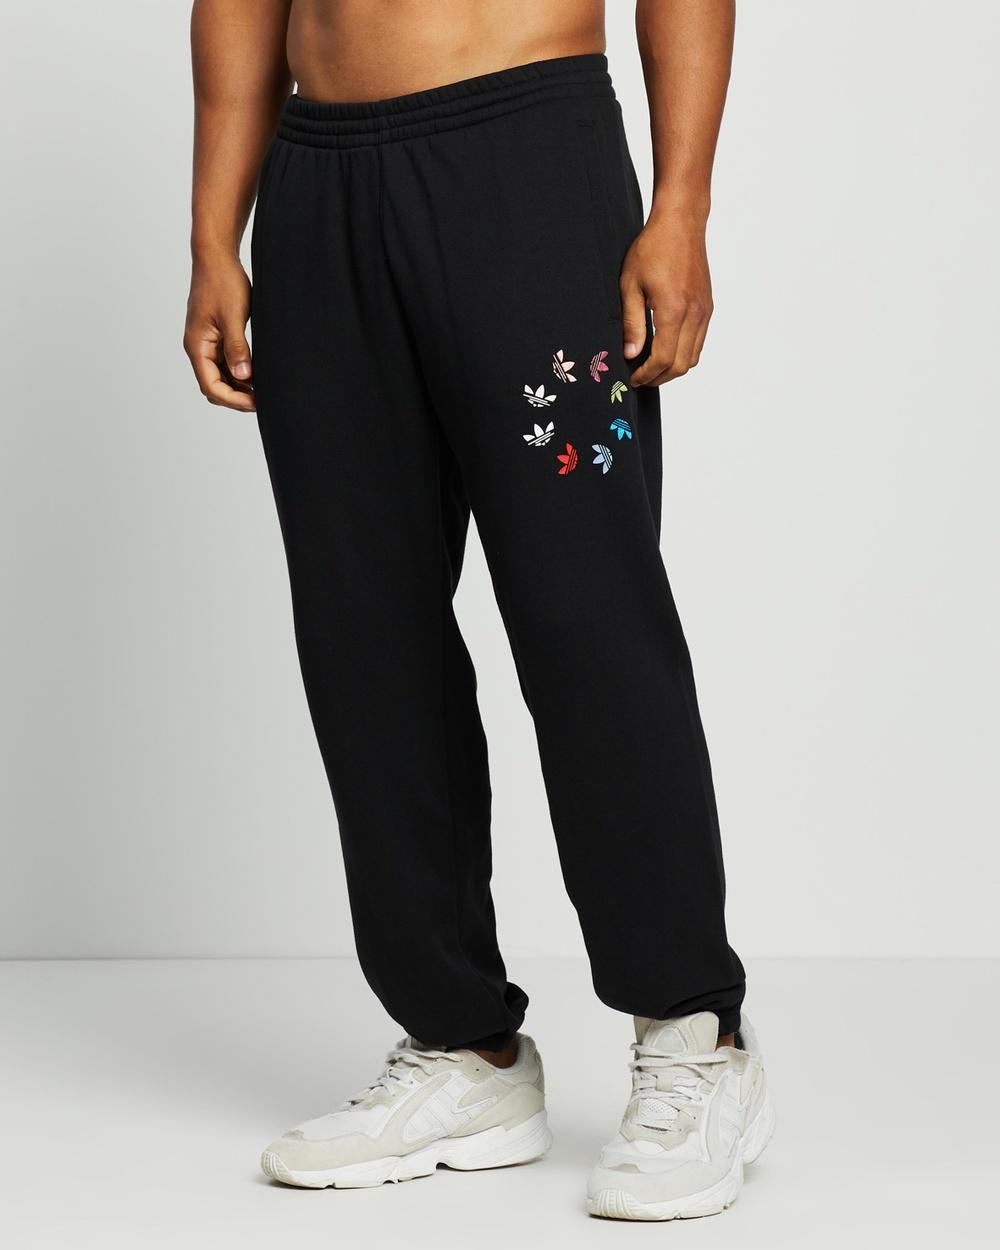 adidas Originals Adicolor Shattered Trefoil Sweat Pants Black & Multicolour